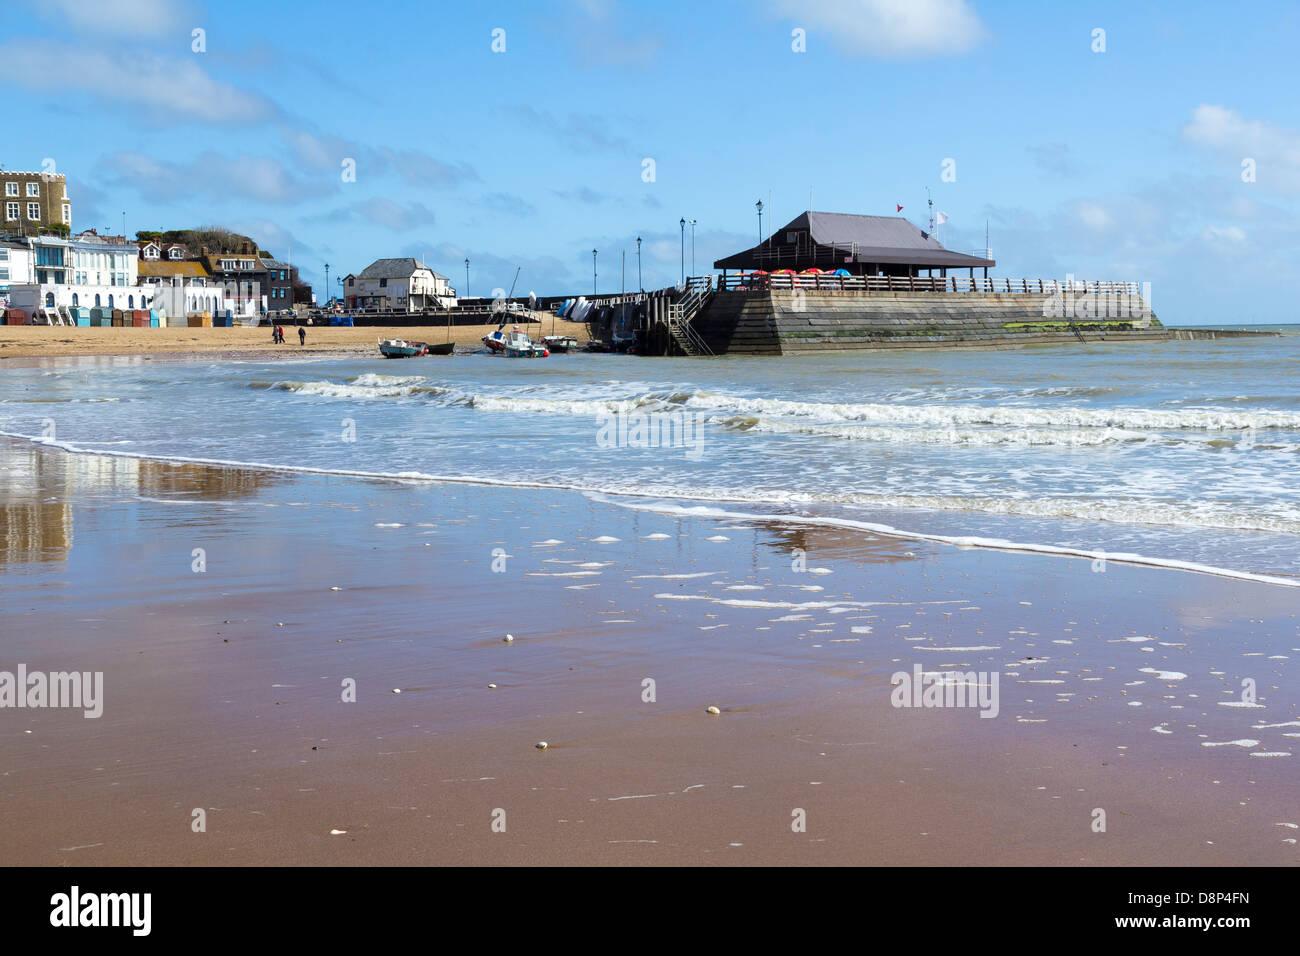 Viking Bay at Broadstairs, on the Isle of Thanet, Kent England UK Stock Photo